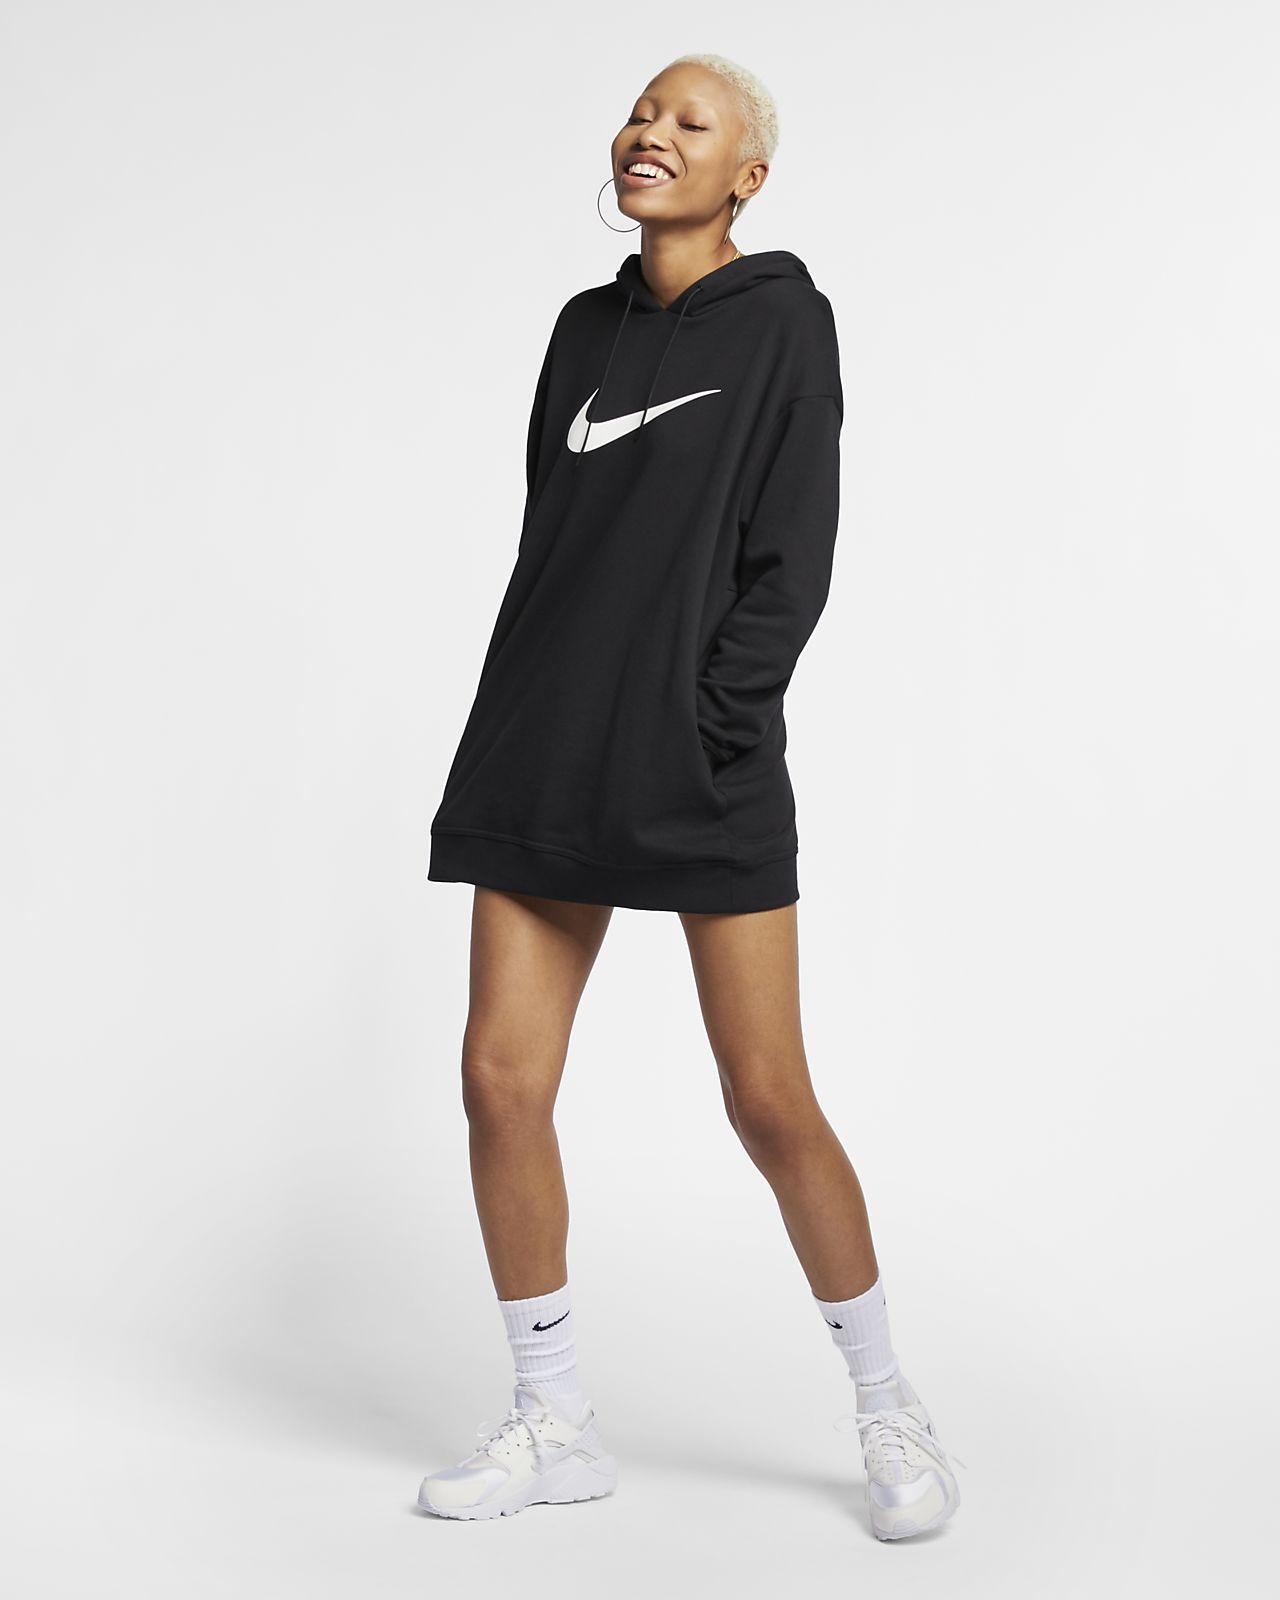 Nike Sportswear Swoosh French Terry 女子连帽衫